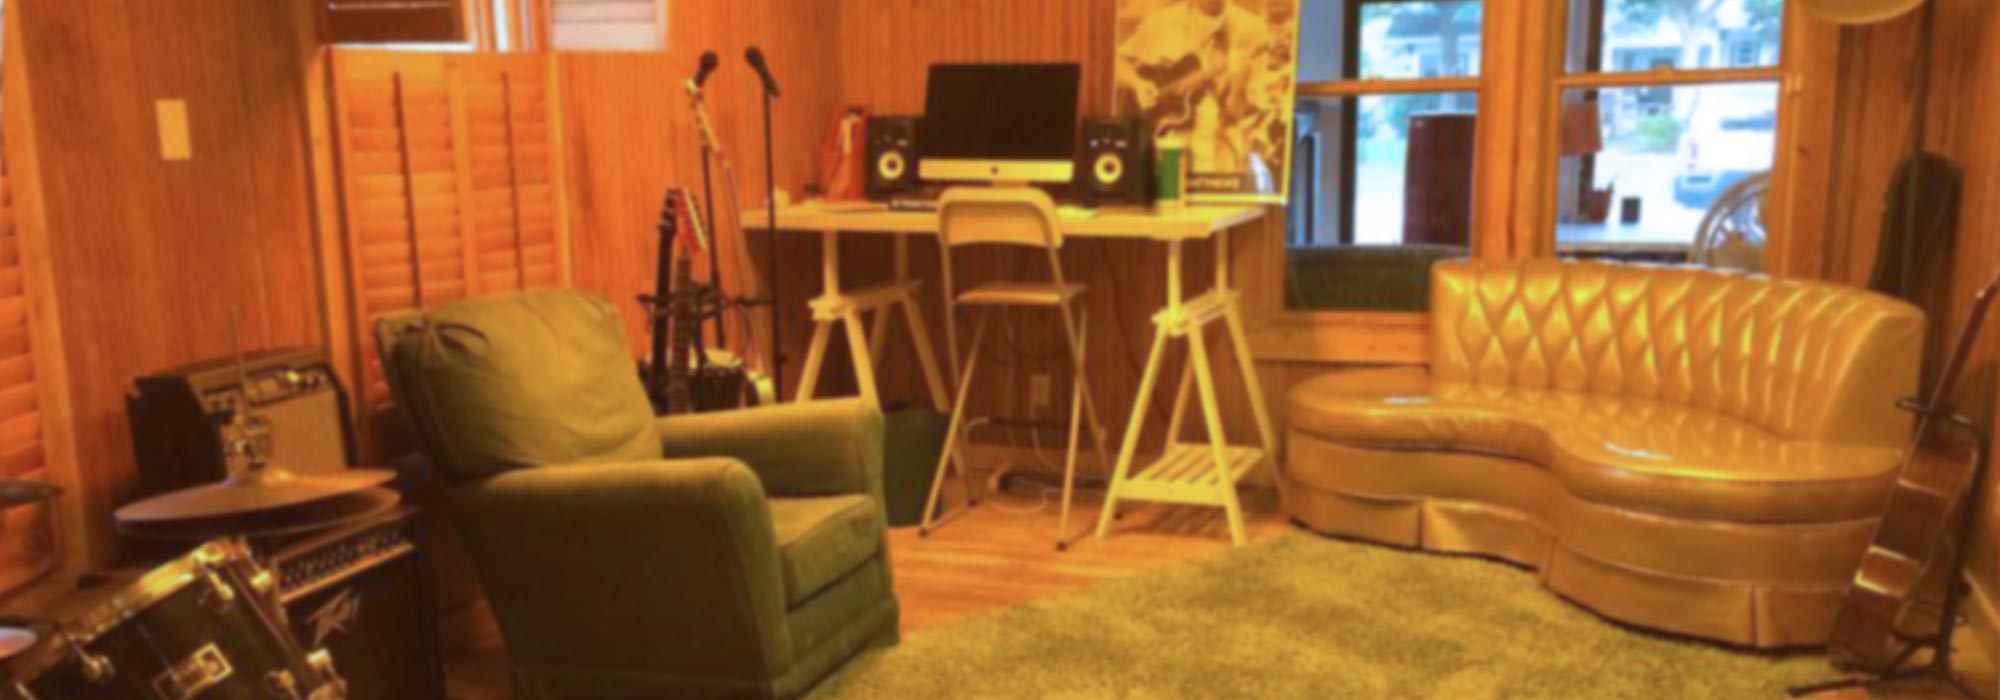 space-of-mind-schoolhouse-studio-img-1